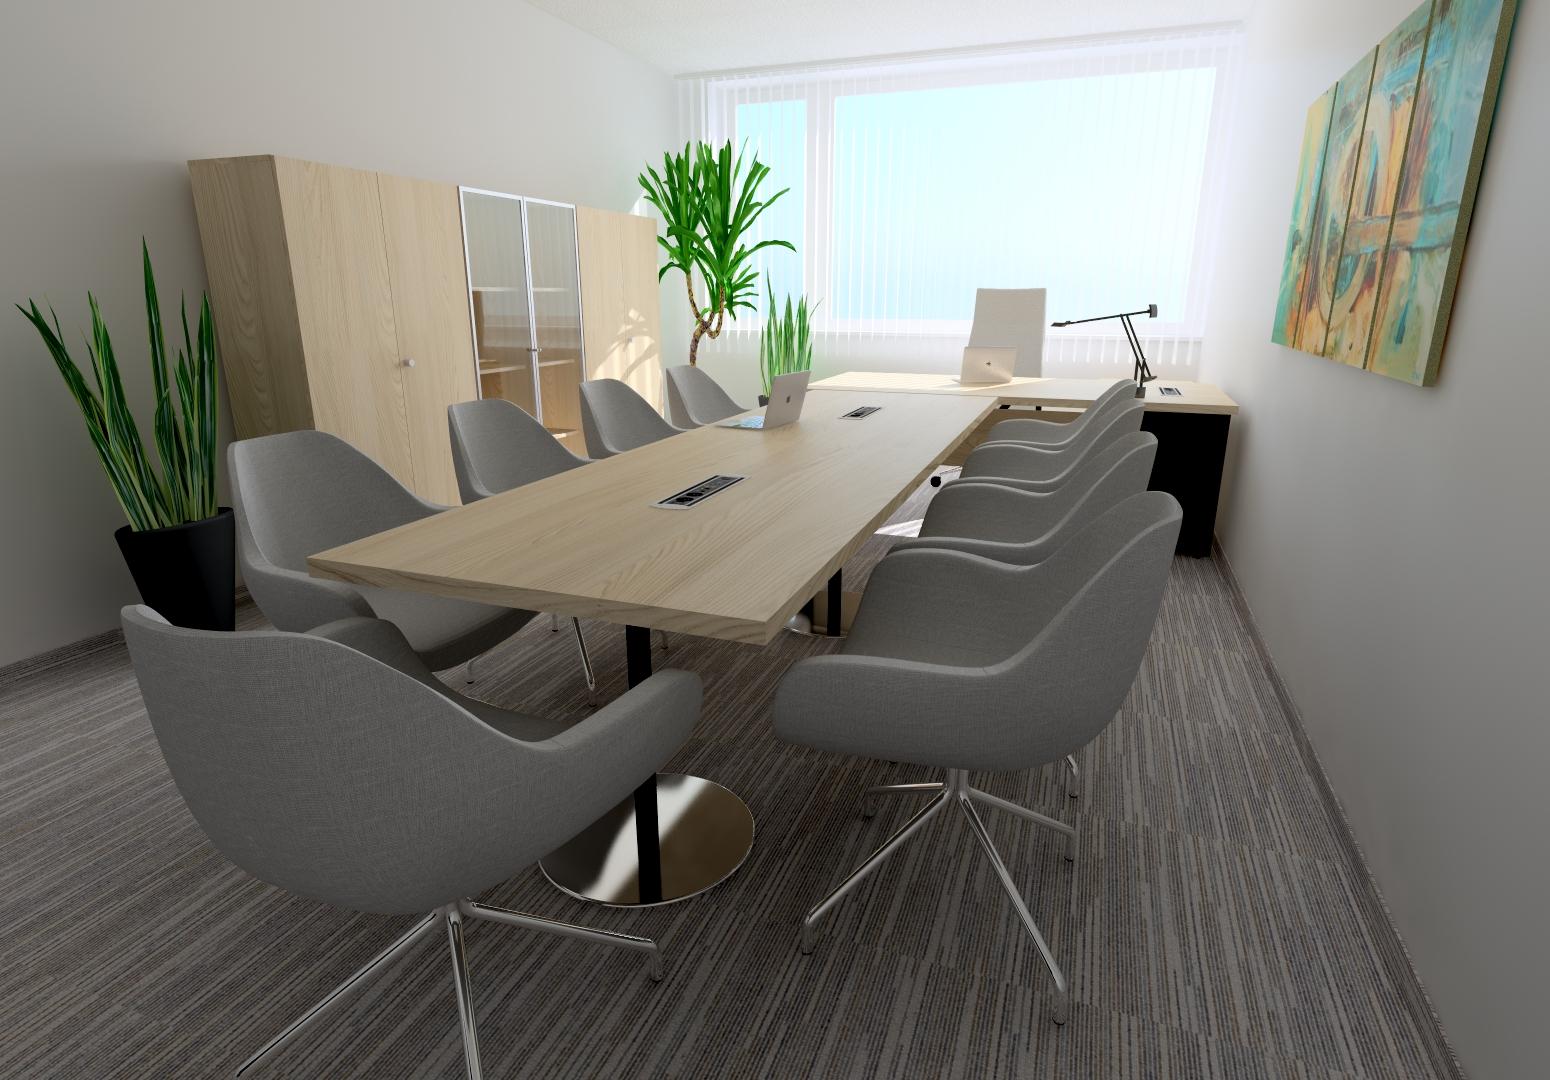 23 Inven dizajn - DAEX DESIGN Start 21